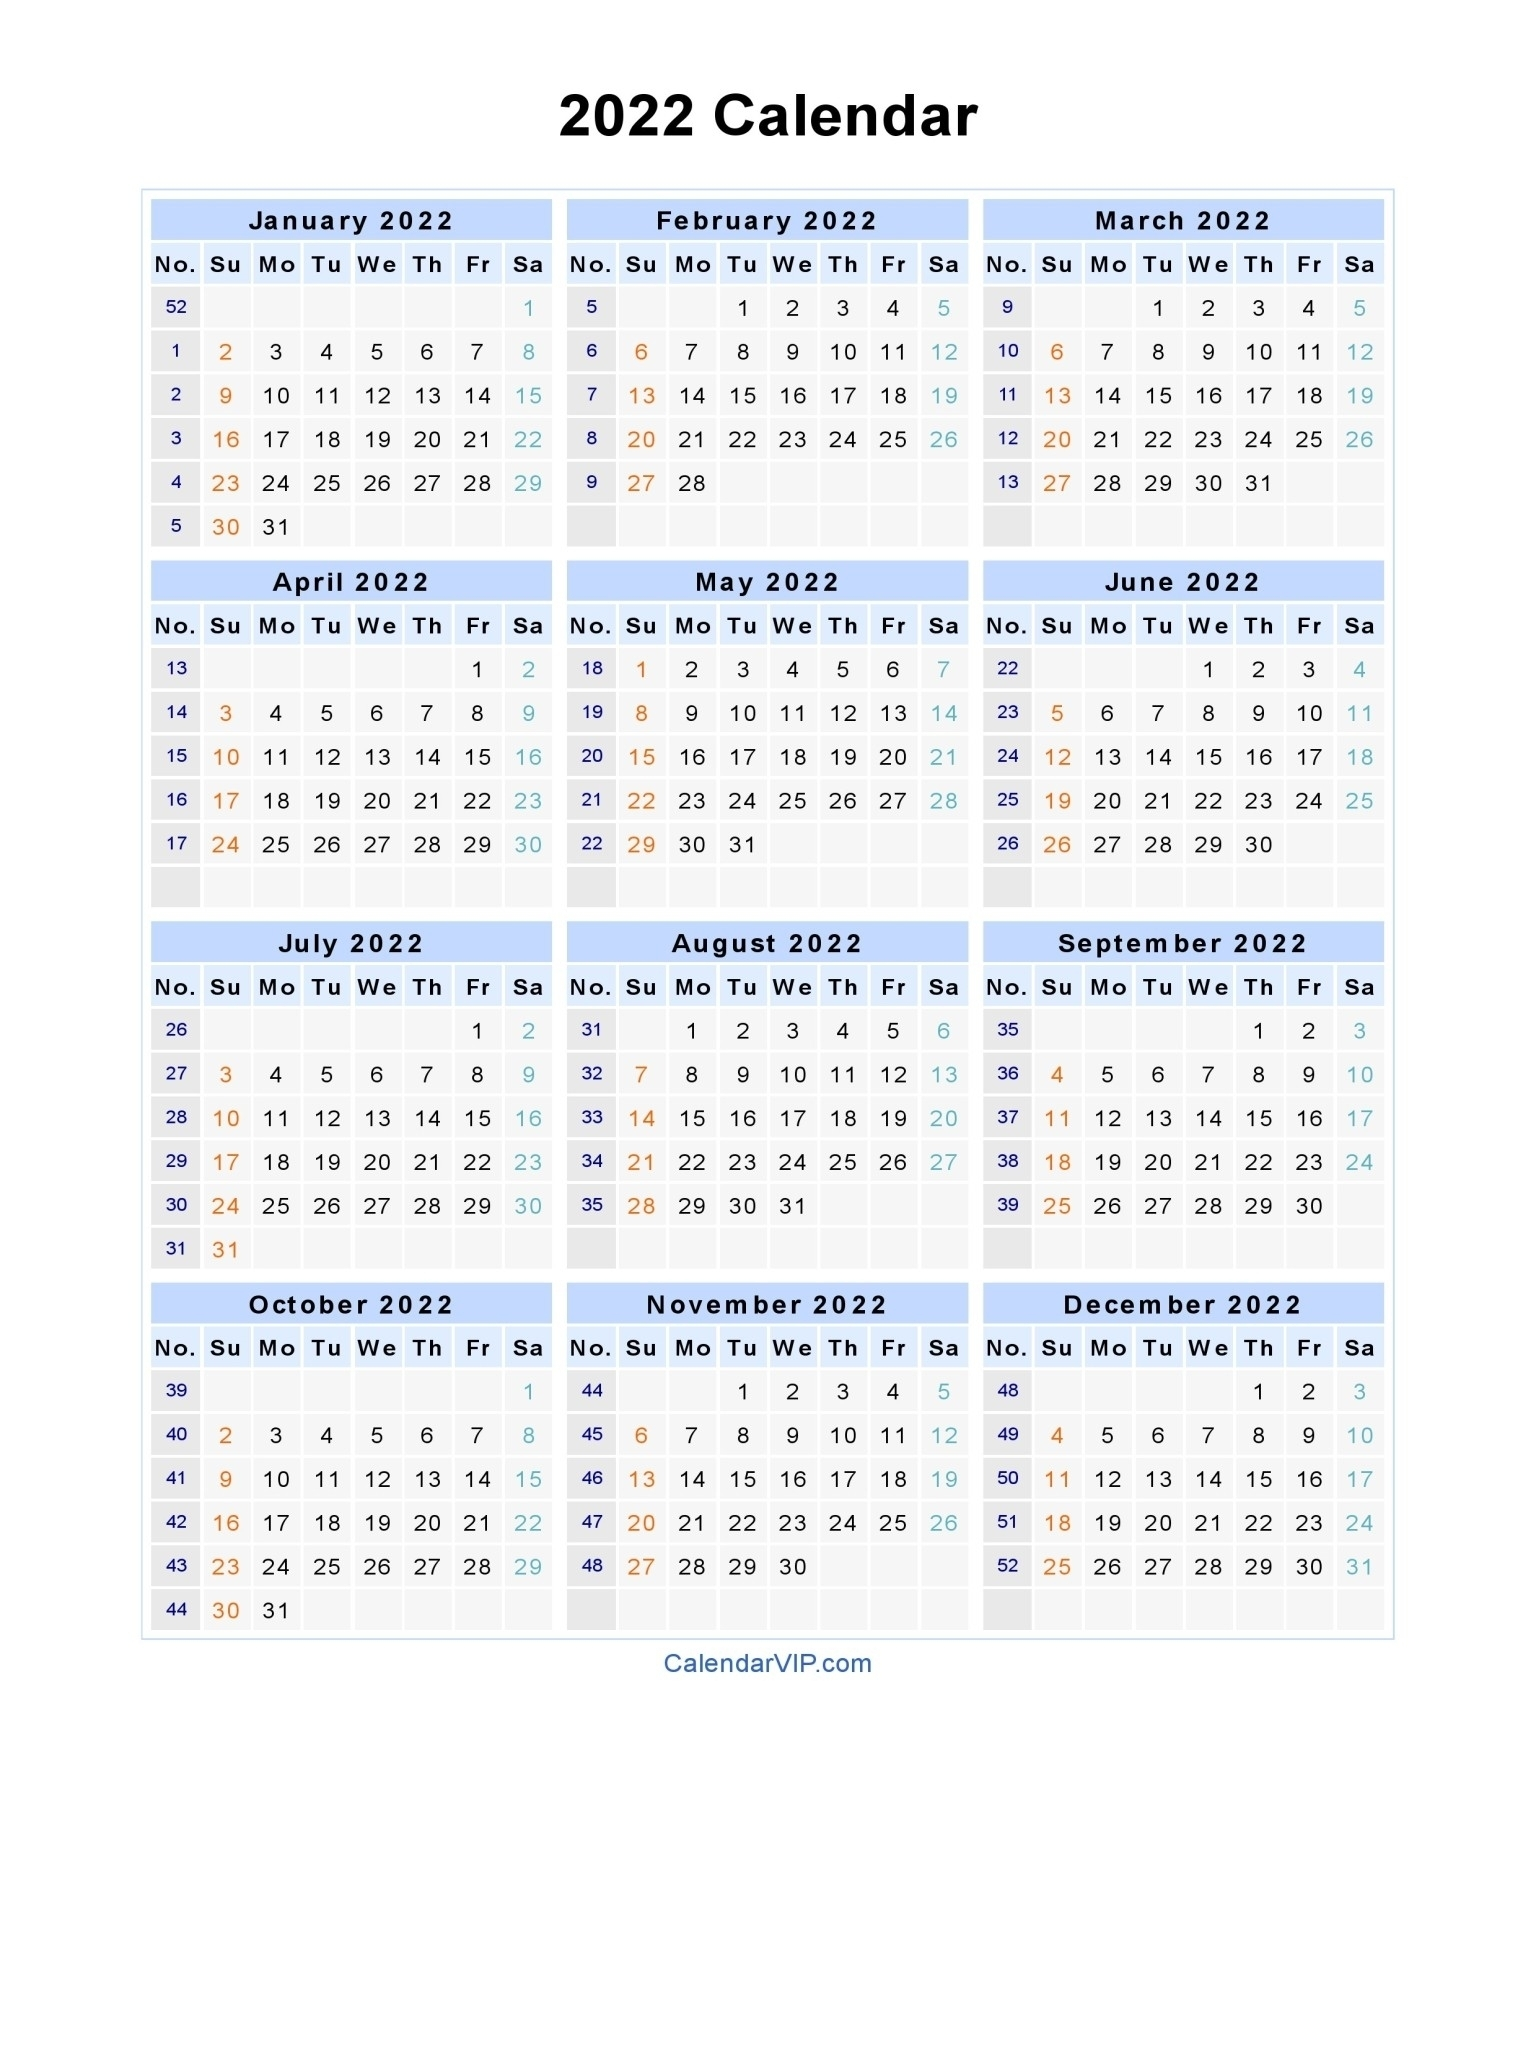 3 Year Calendars 2021 2022 2023 Free Printable | Calendar Template Printable